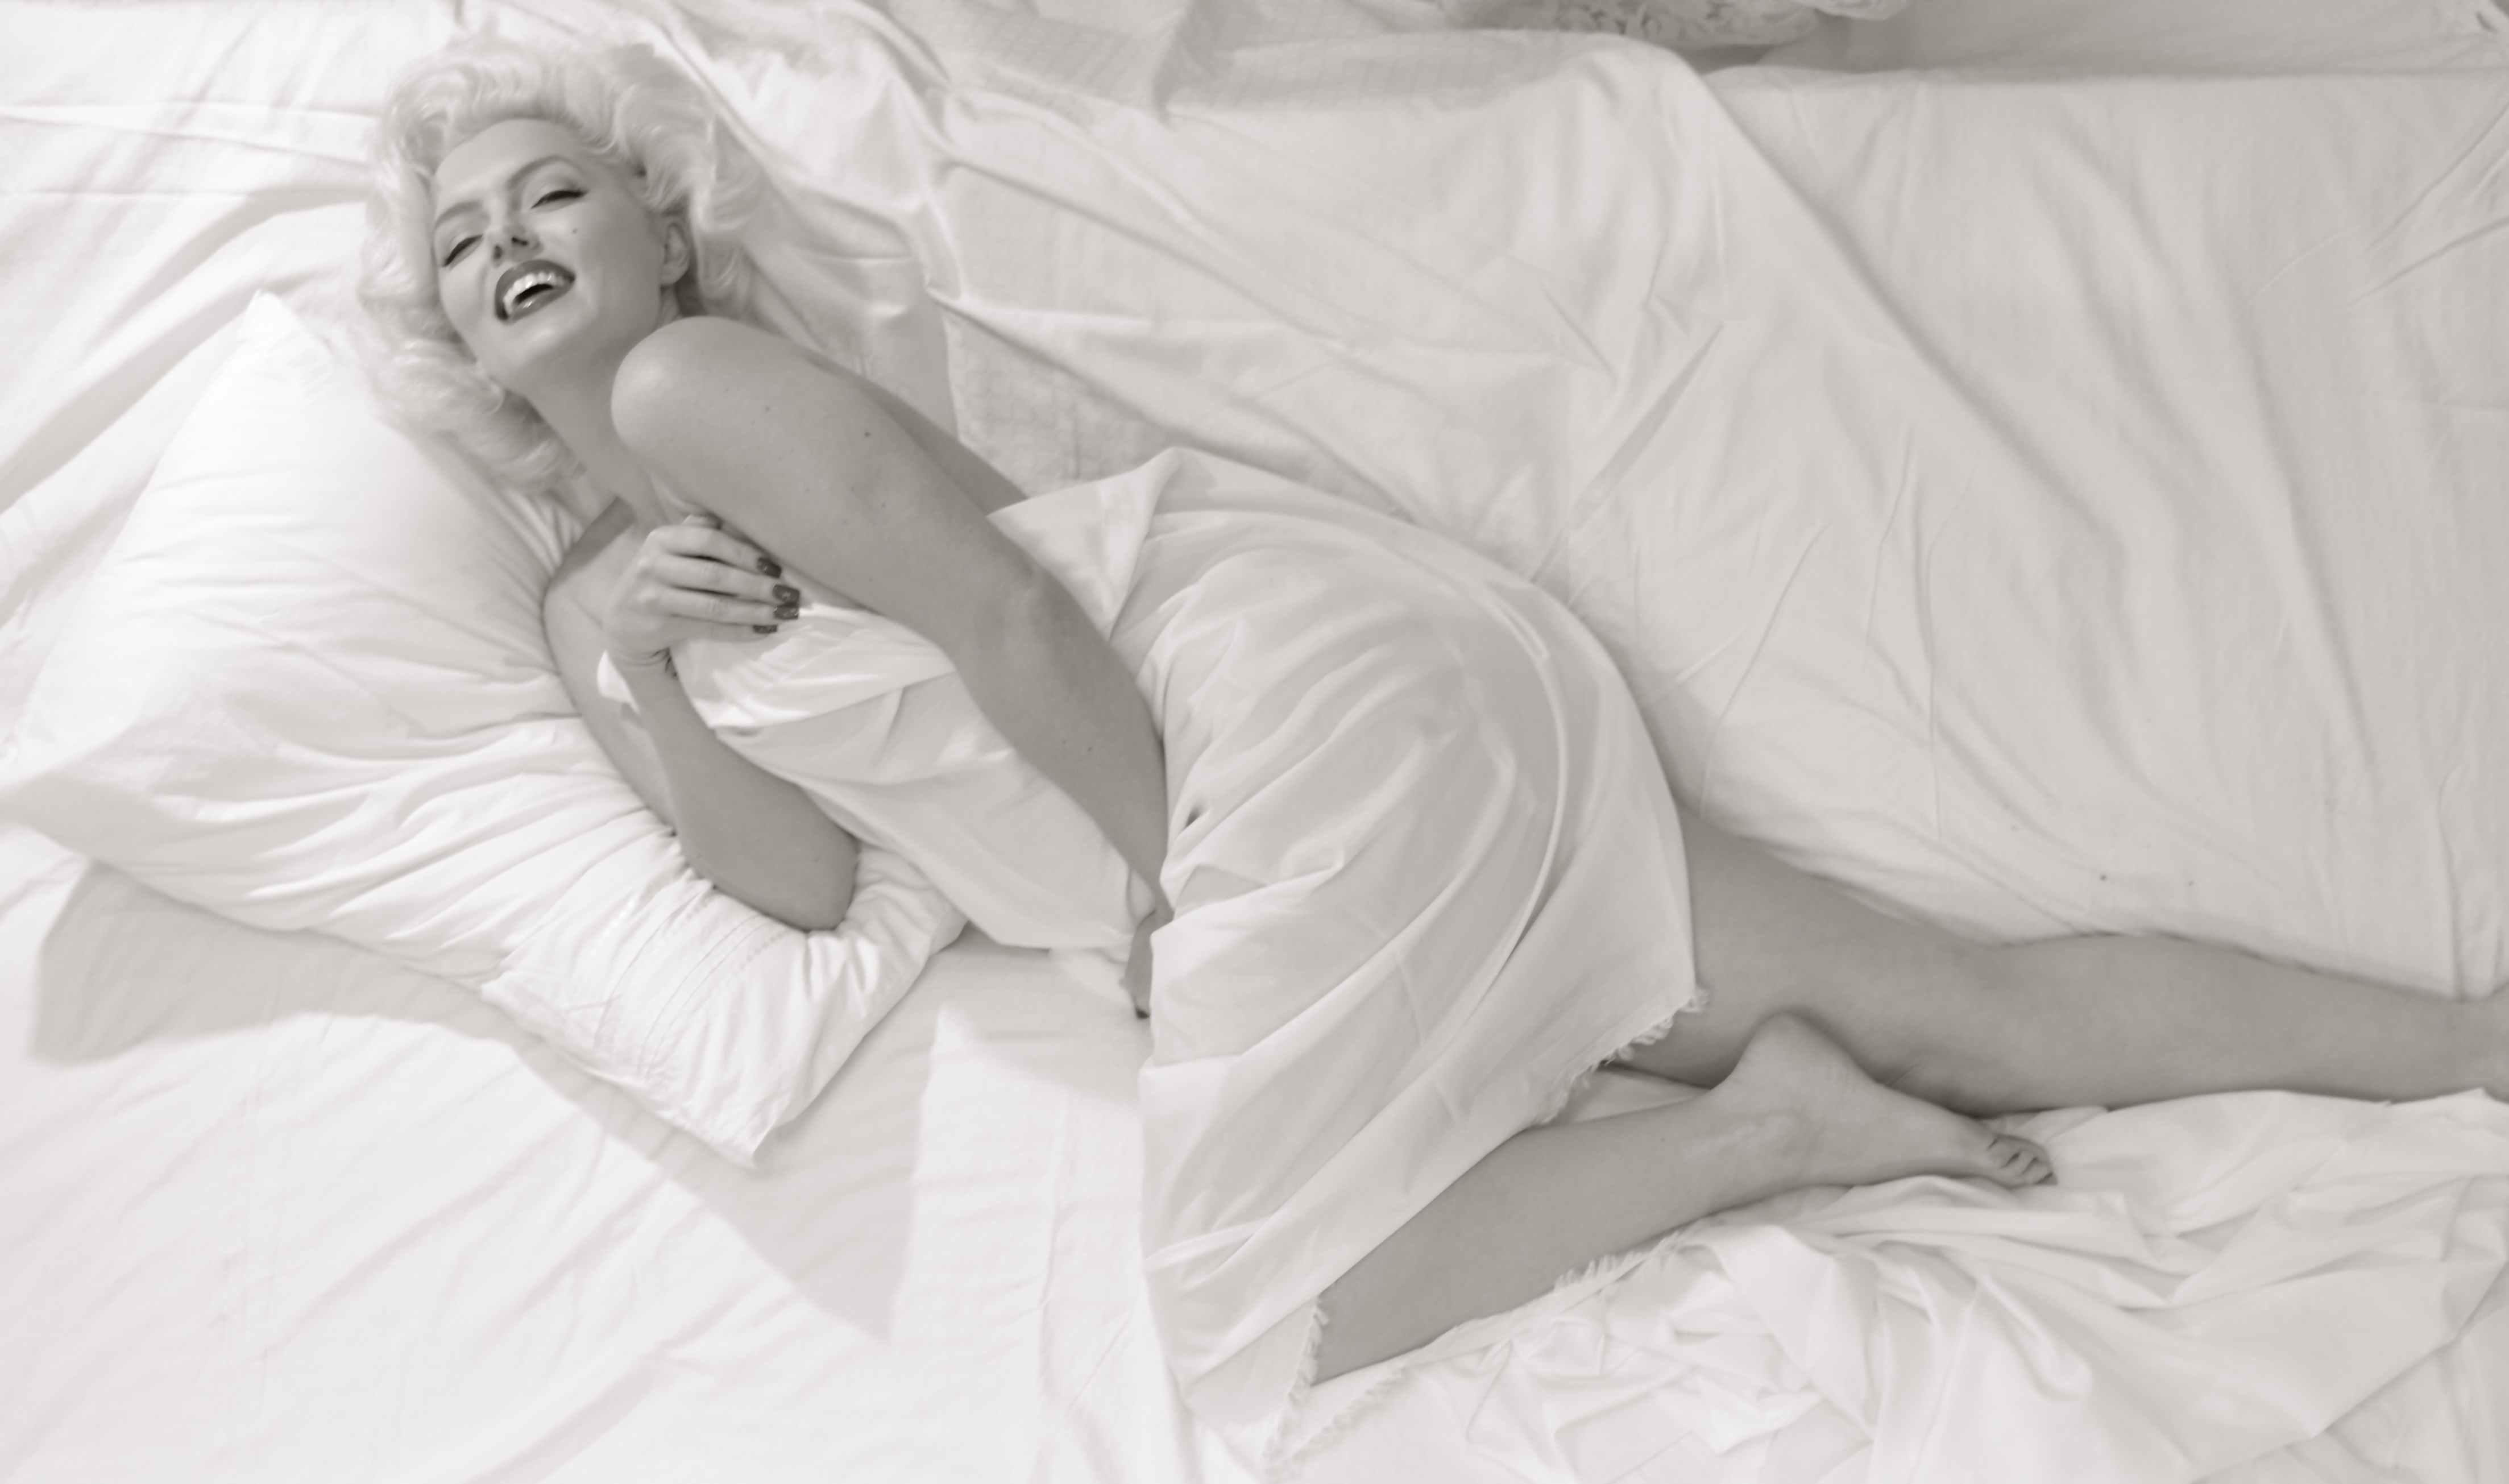 Risultati immagini per marilyn monroe at bed